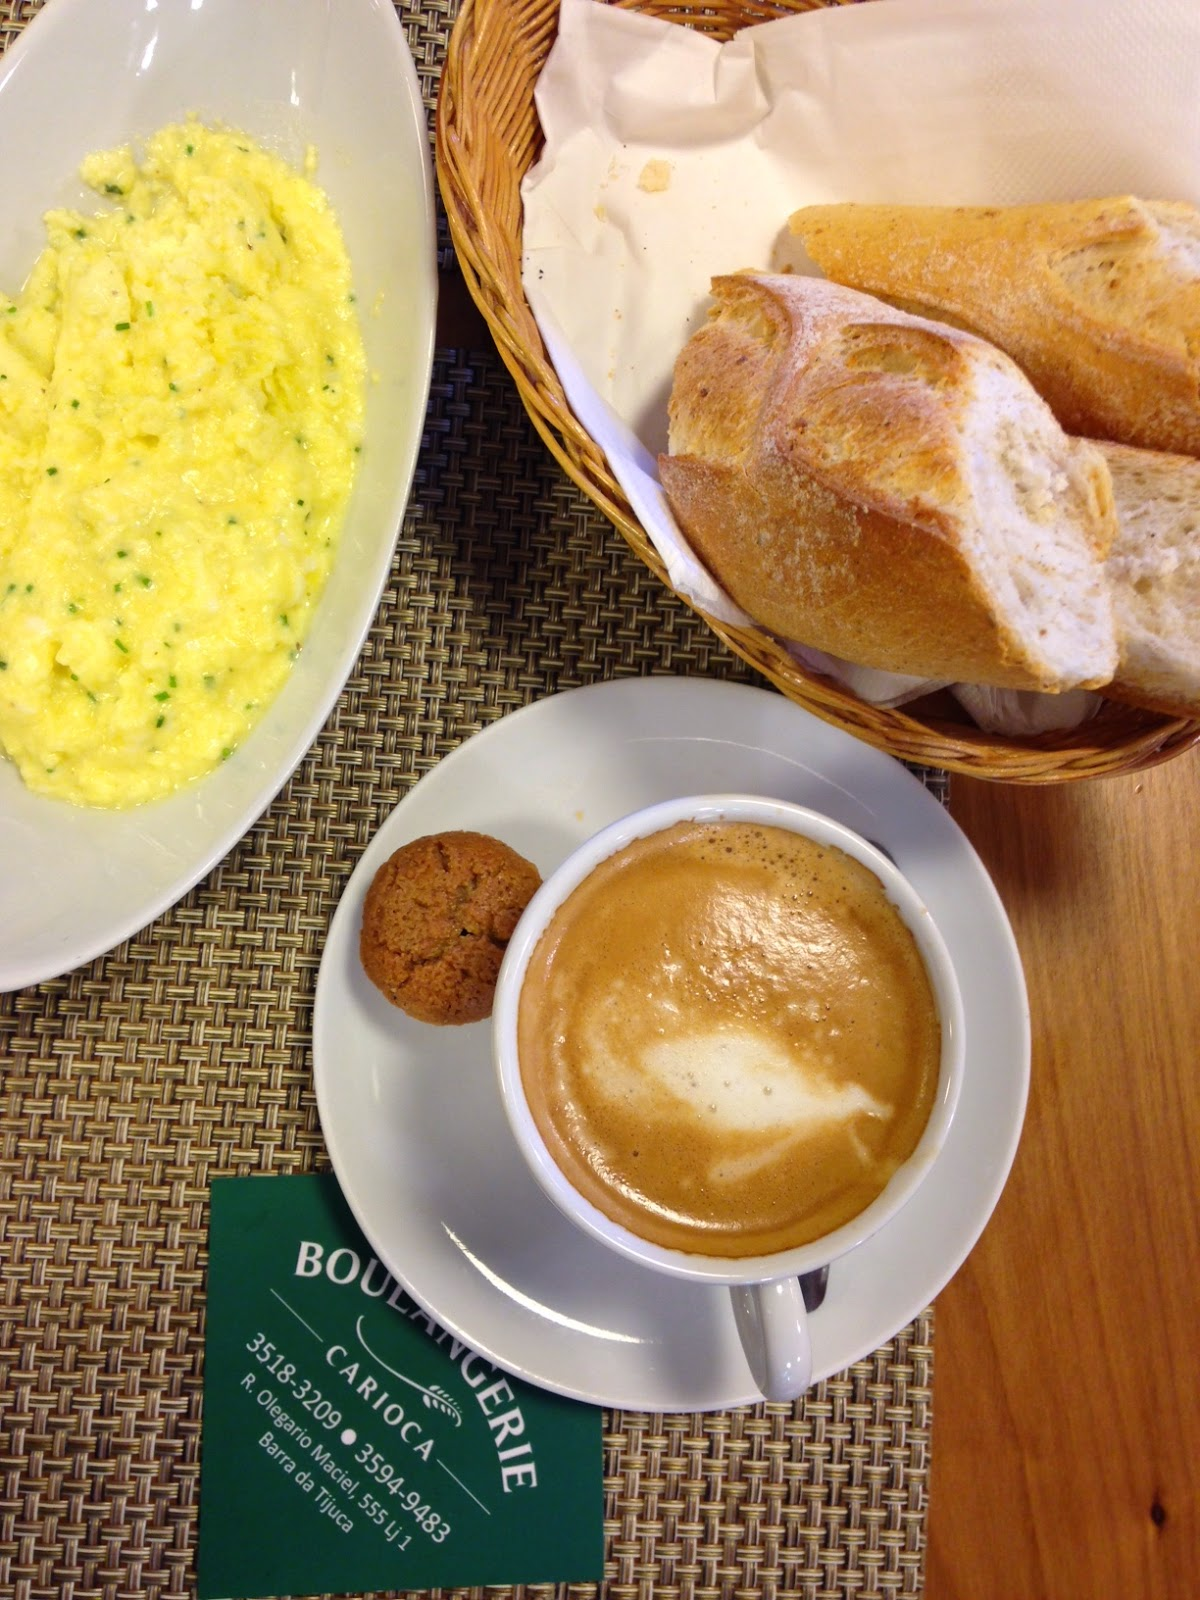 Café da manhã delicioso na Boulangerie Carioca